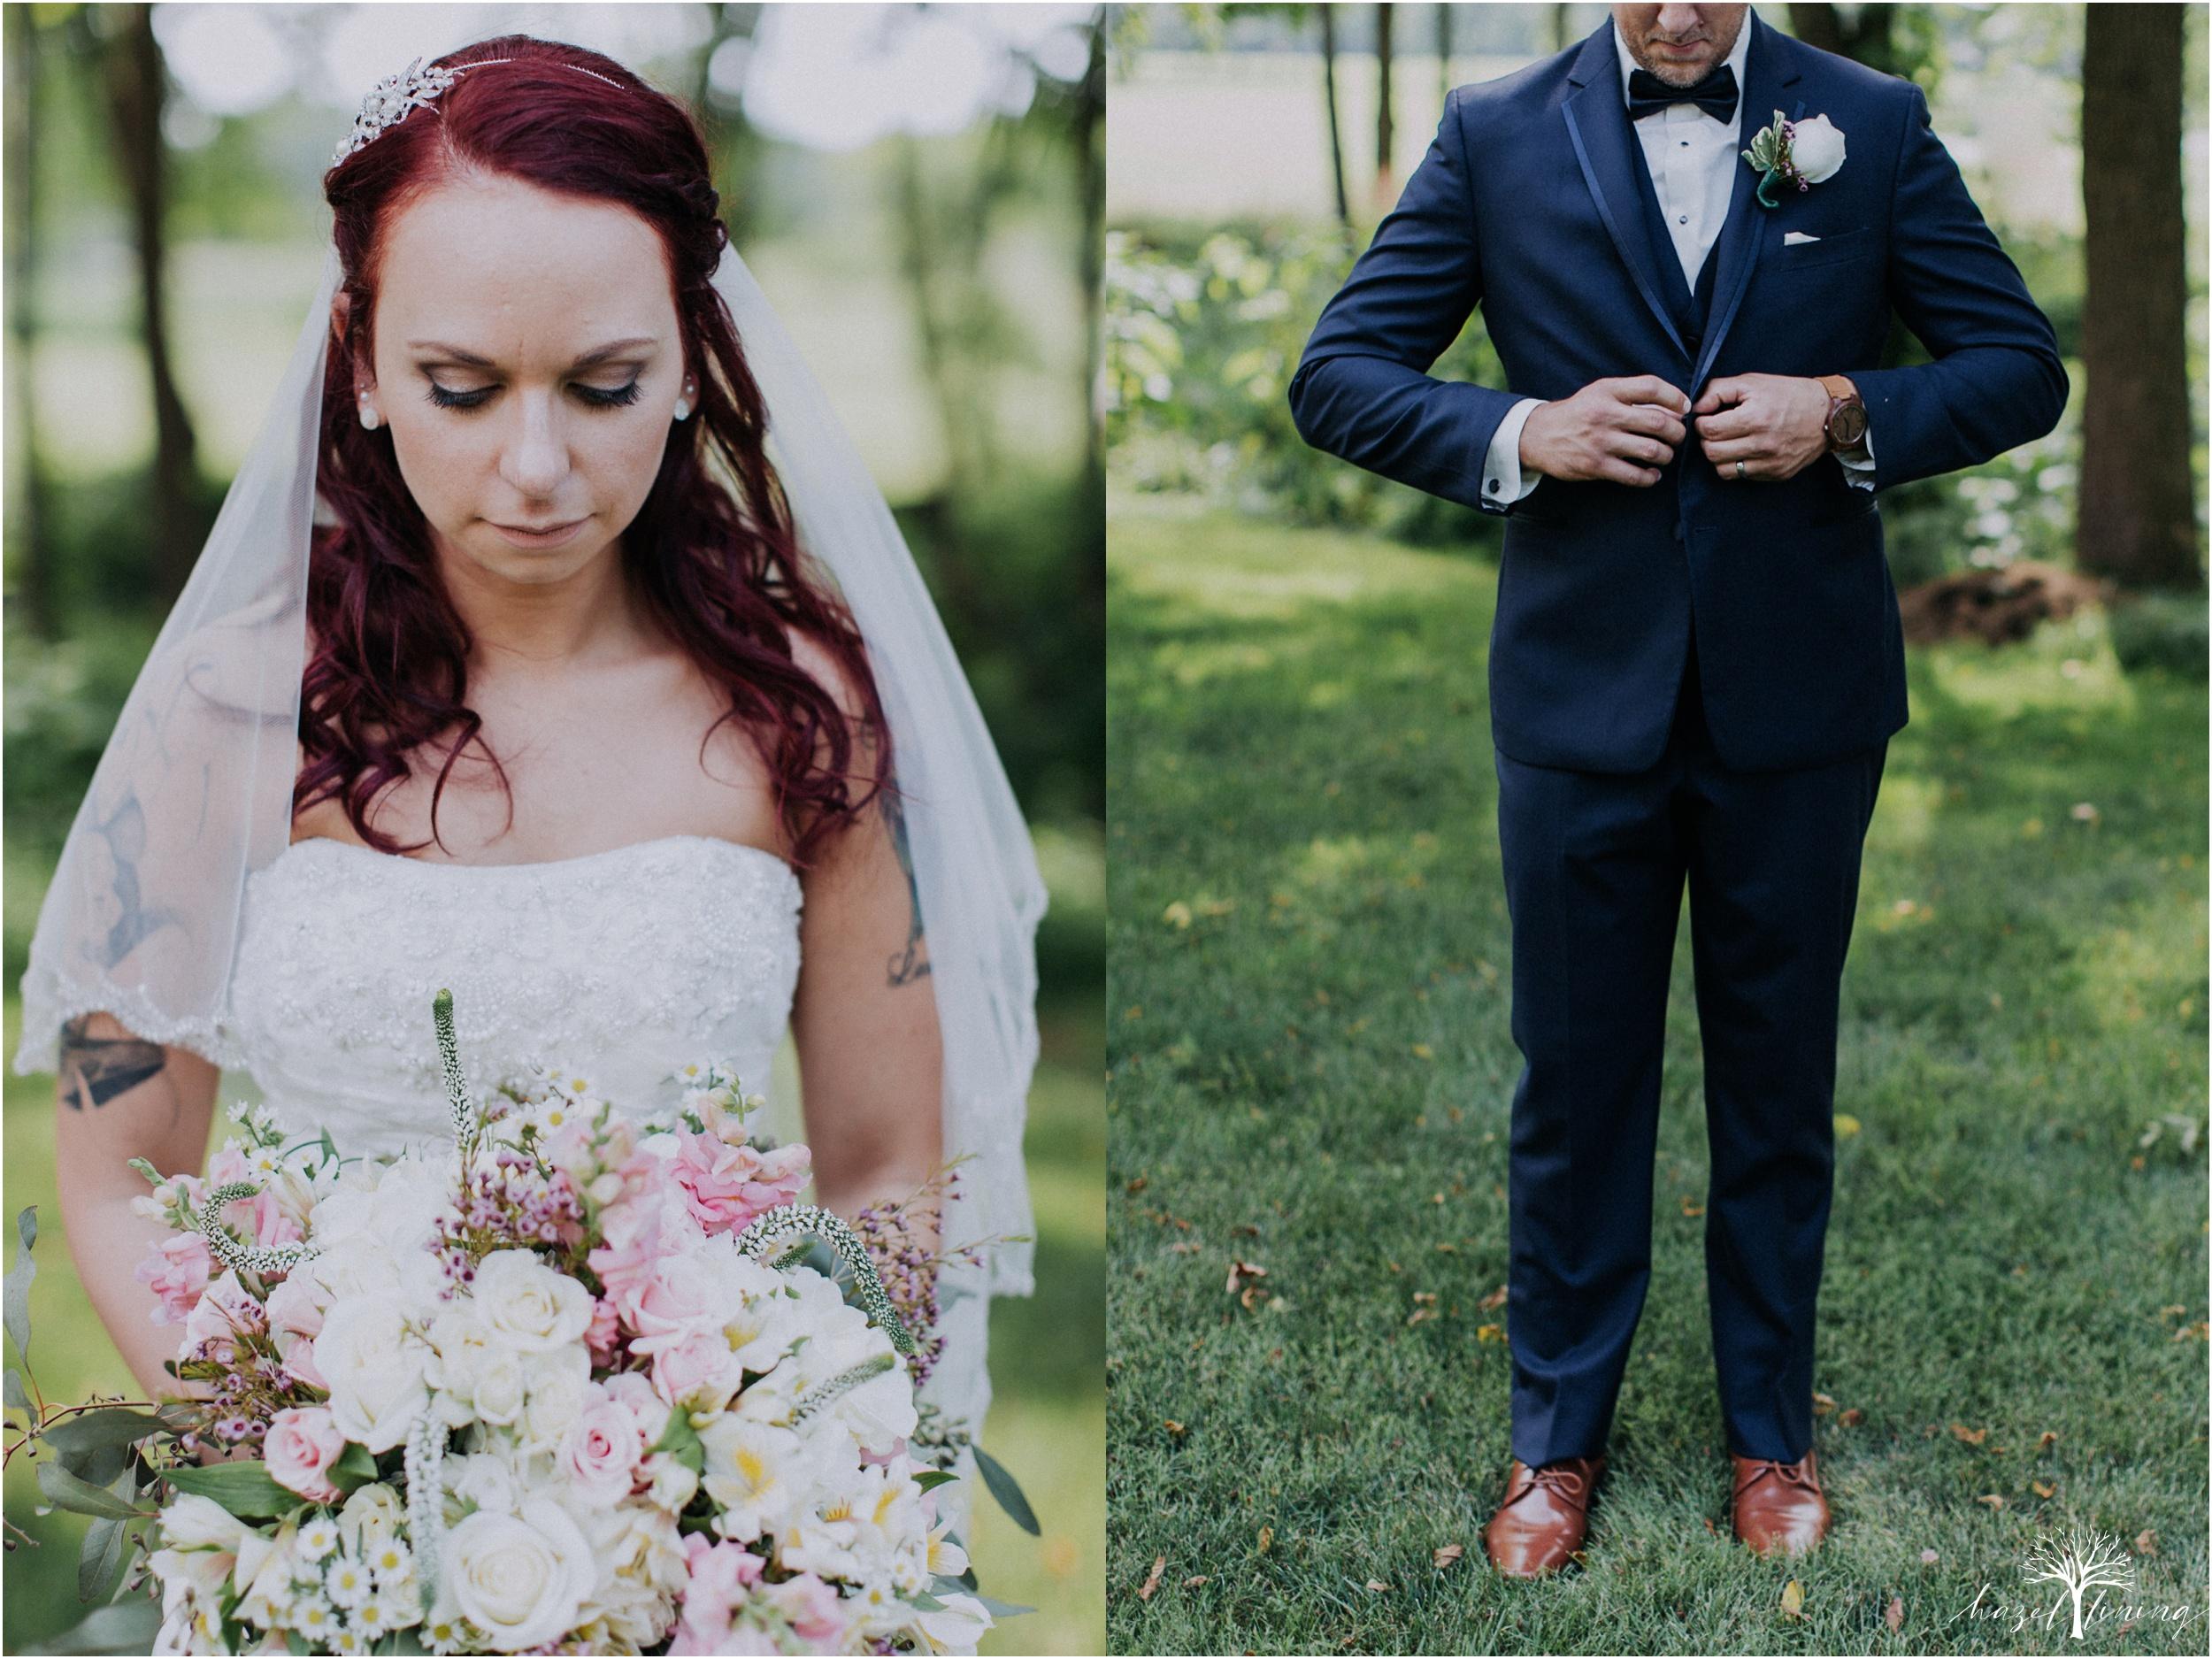 alyssa-james-stiteler-wedding-loft-and-sweet-water-cc-pennsburg-pennsylvania-hazel-lining-travel-wedding-elopement-photography_0101.jpg